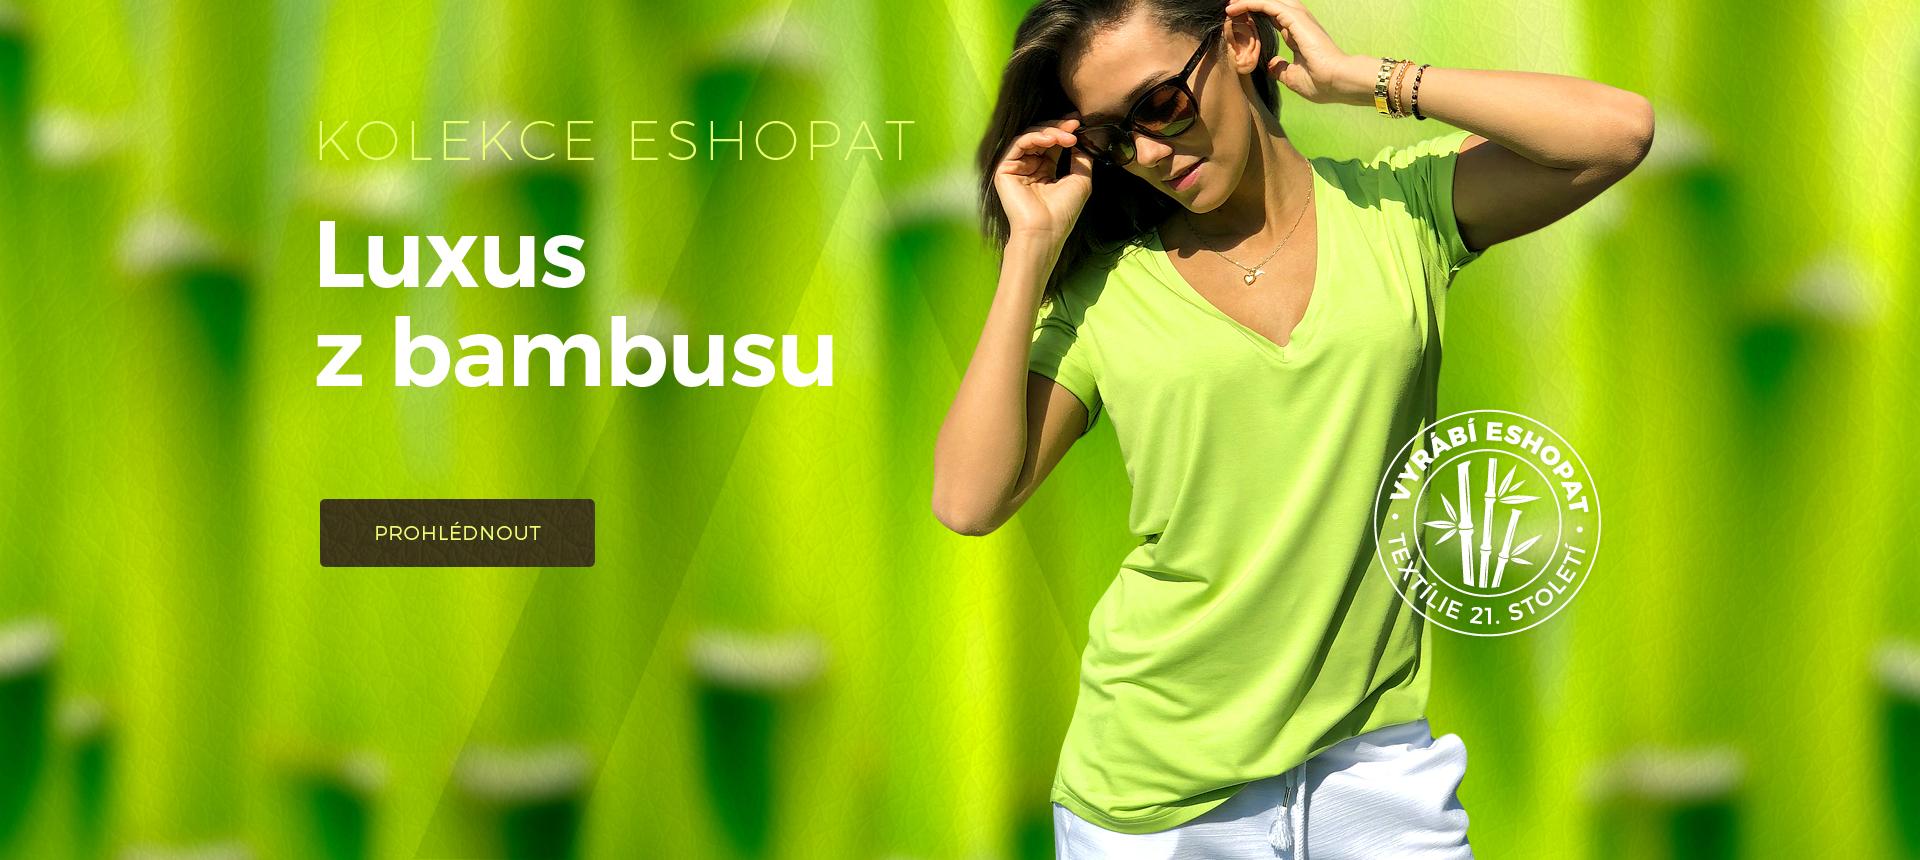 eshopat-cz-banner-hp-bambus